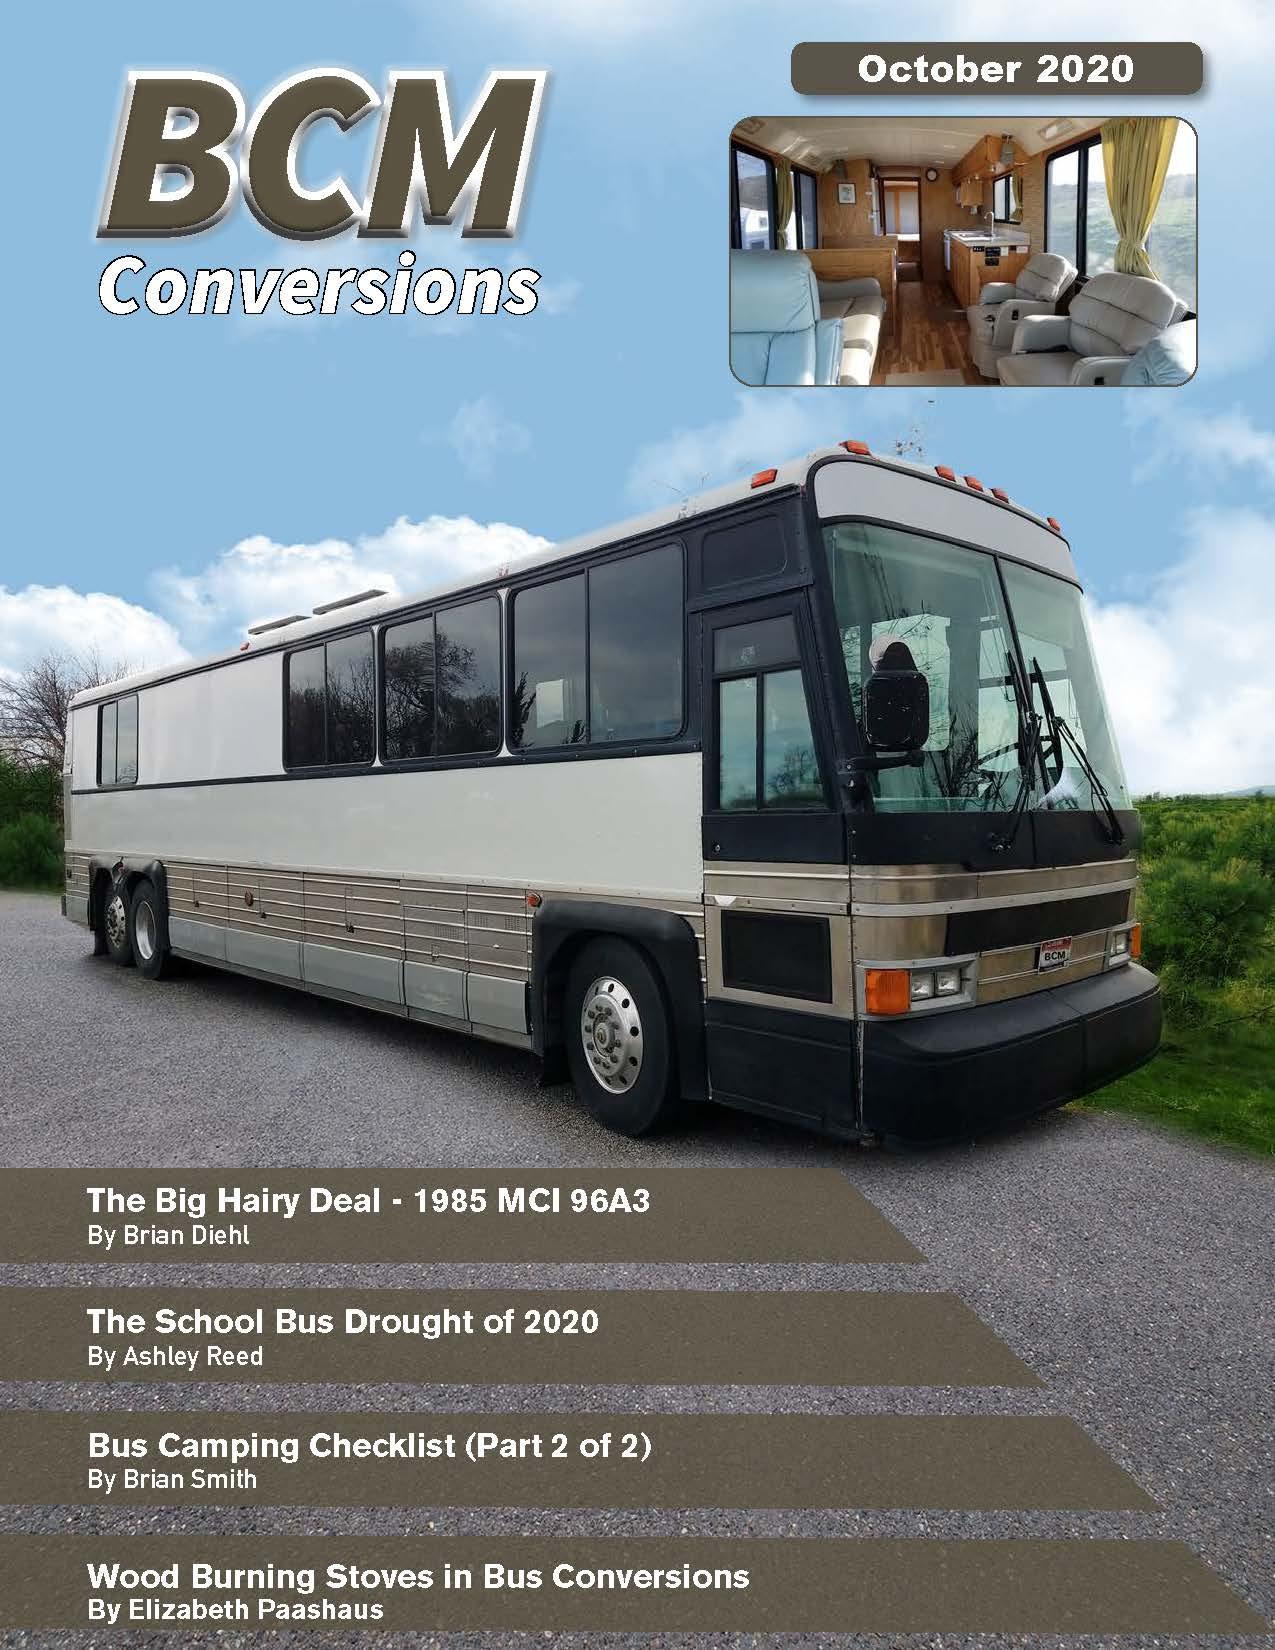 "<a href=""""><img class=""spu-open-10240"" src=""https://www.busconversionmagazine.com/wp-content/uploads/2020/09/October-Issue-2020-Toc.jpg""/></a>"